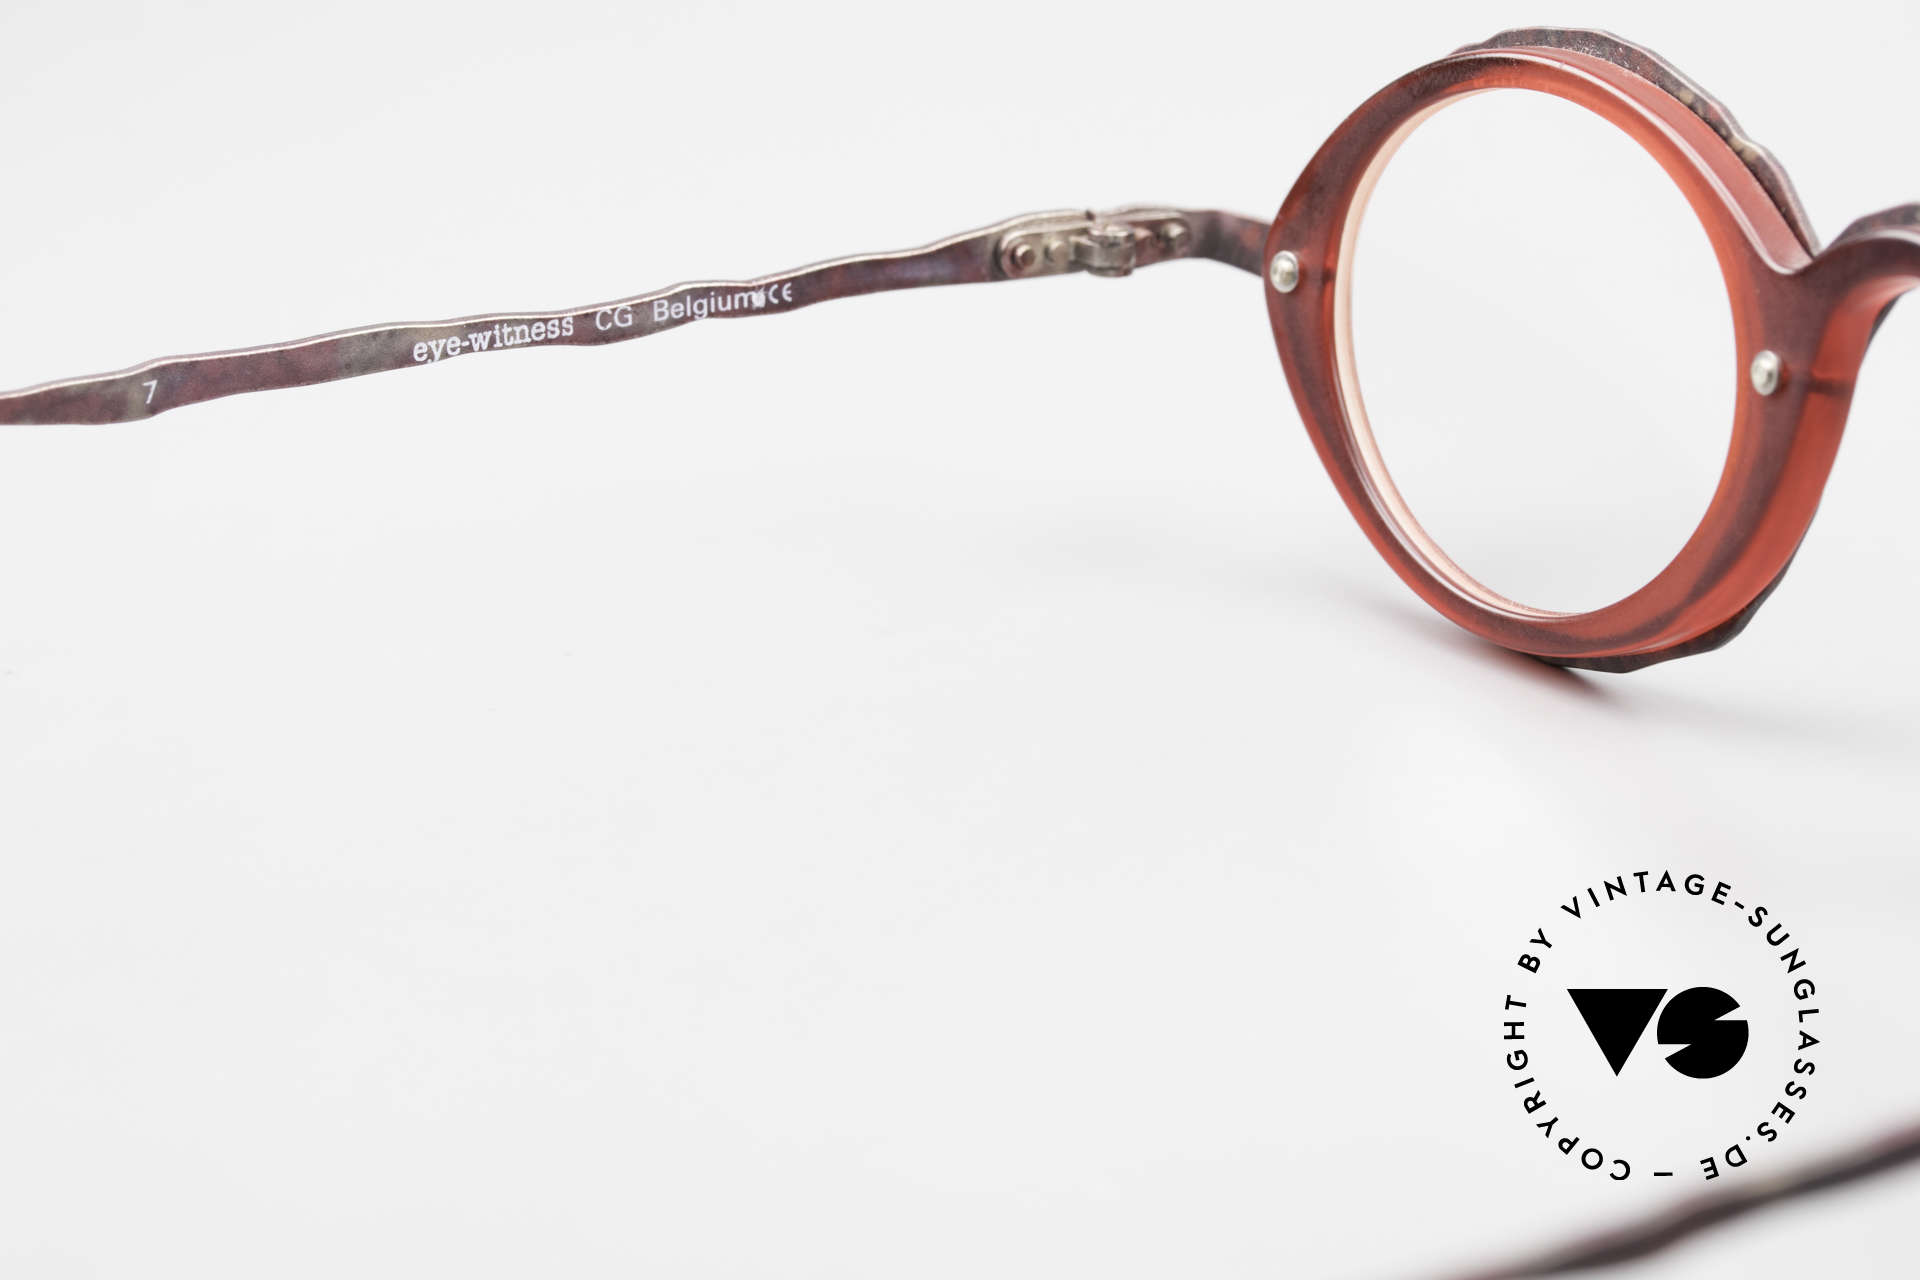 Theo Belgium Eye-Witness GG Avant-Garde Eyeglasses 90's, NO RETRO EYEGLASSES, but a rare old 1990's ORIGINAL, Made for Men and Women